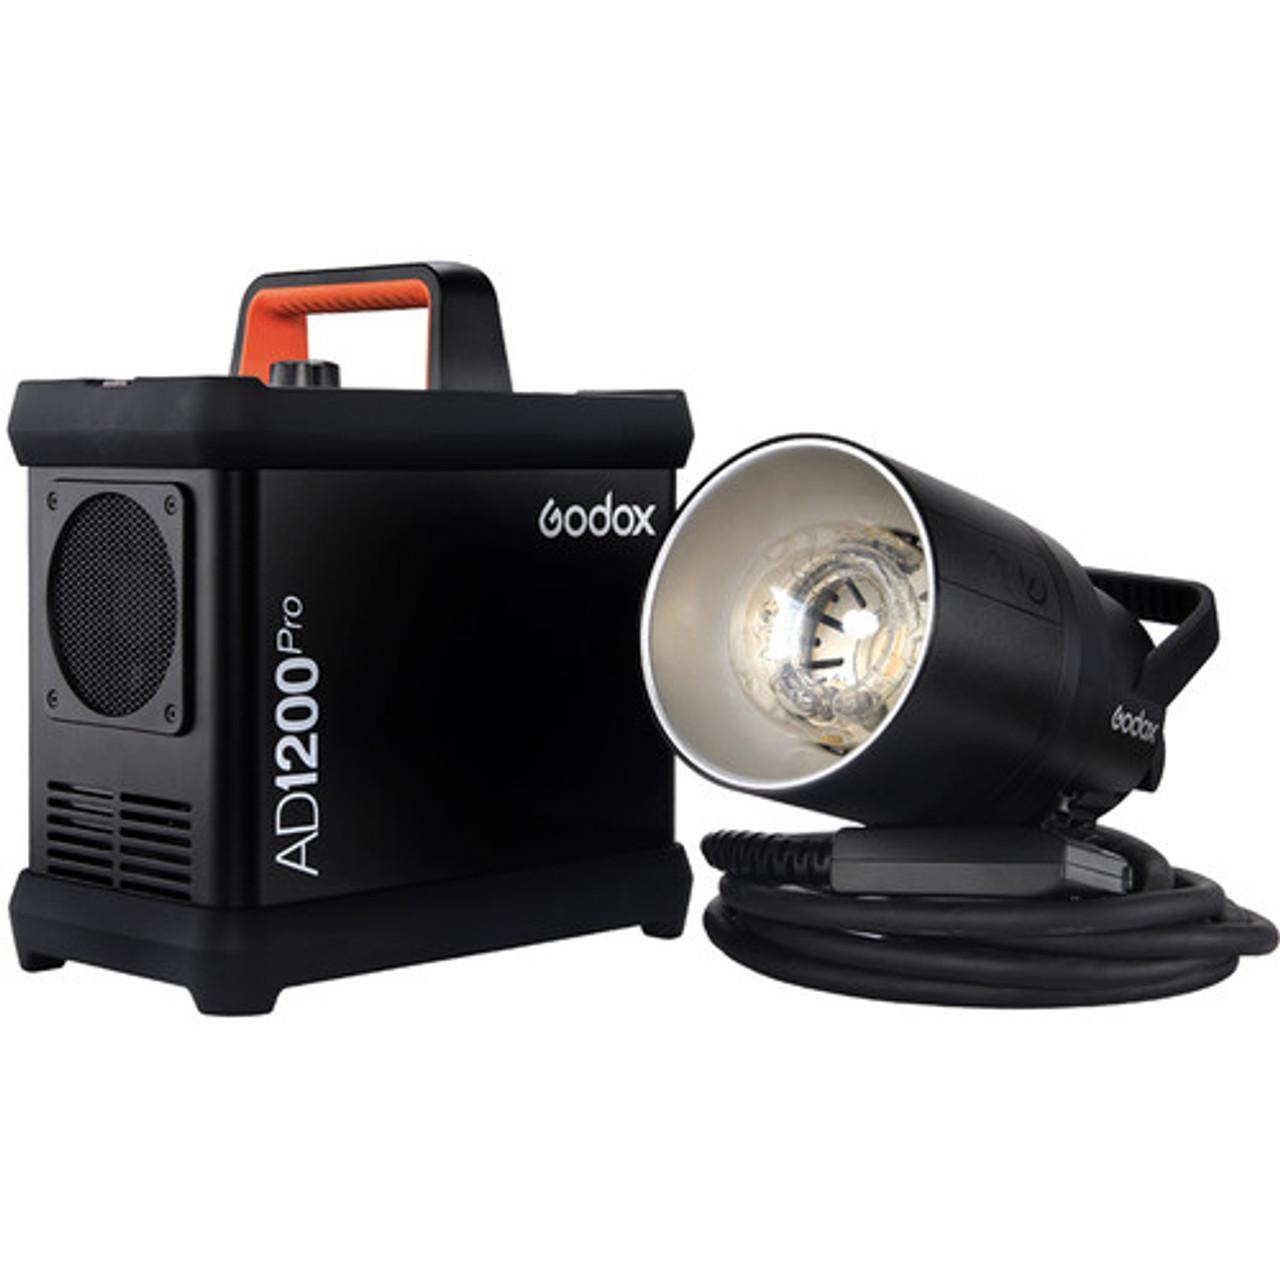 Godox AD1200 Pro LED Light Kit with Extra Battery